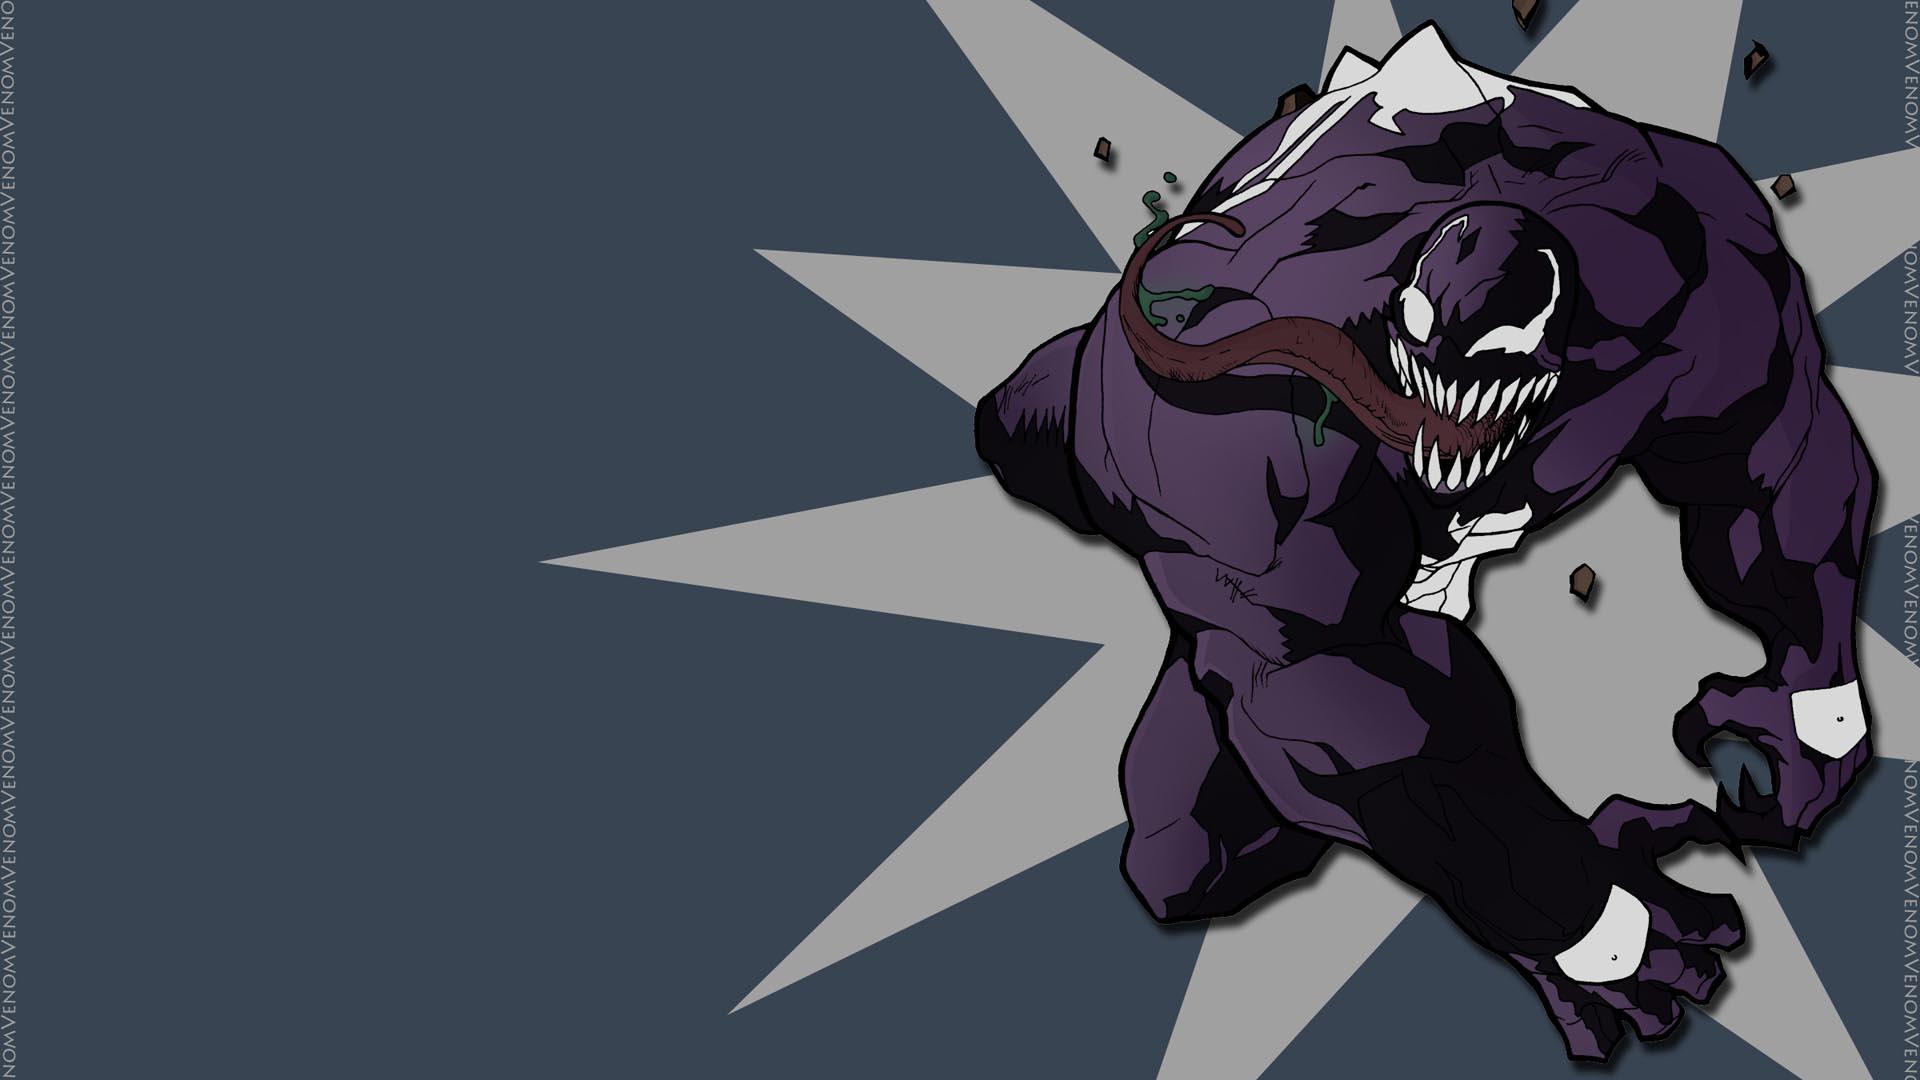 Wallpapers De Venom De Spiderman   Taringa 1920x1080